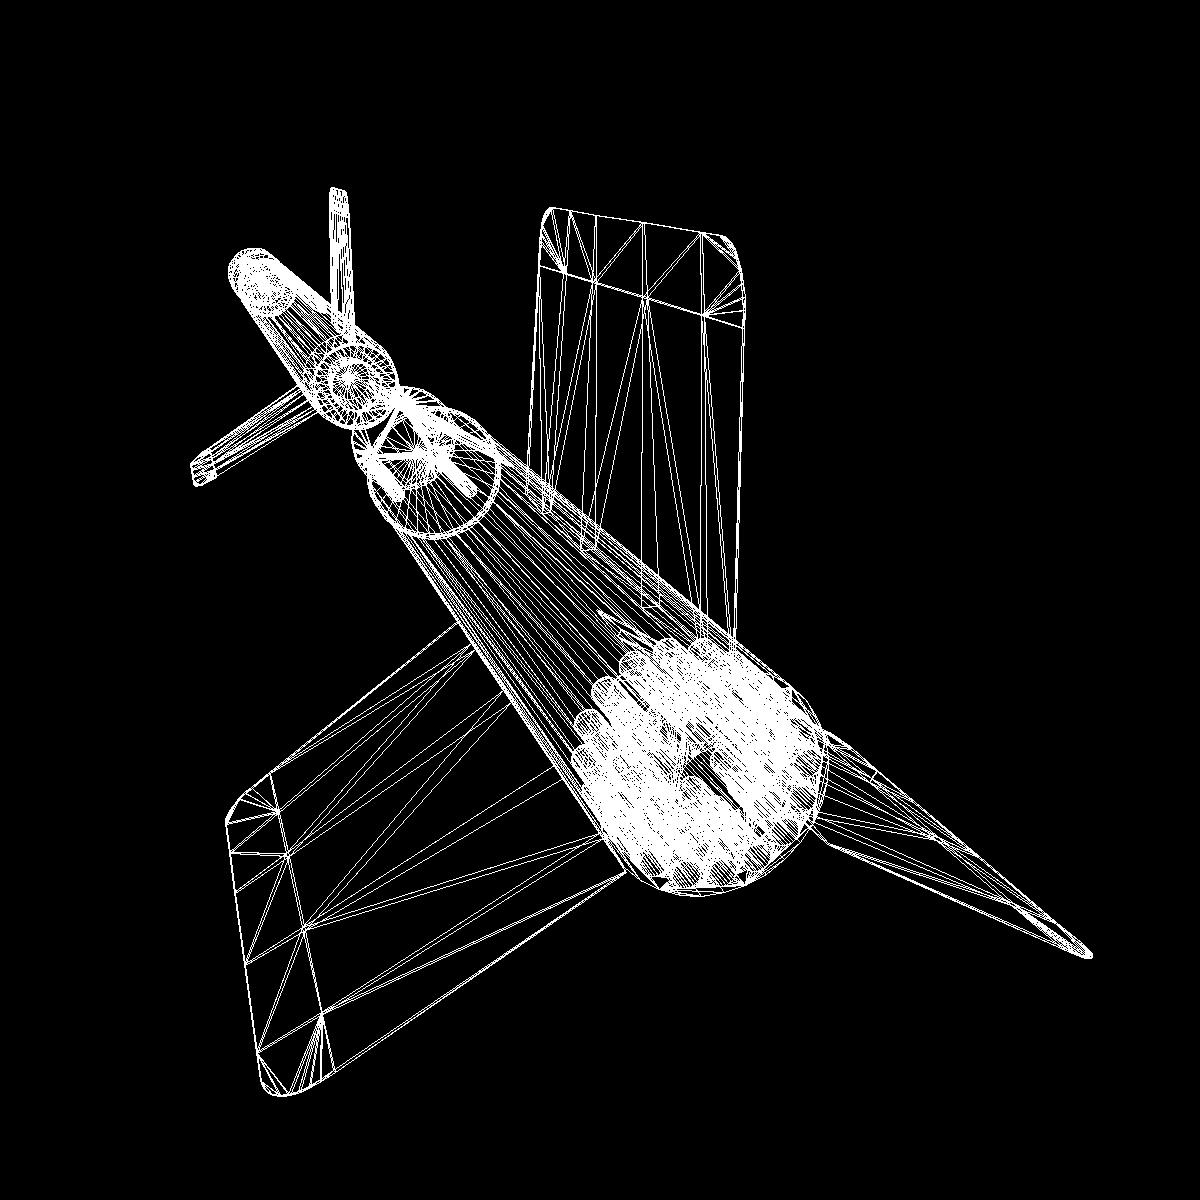 us wac corporal rocket 3d model 3ds dxf x cod scn obj 149636